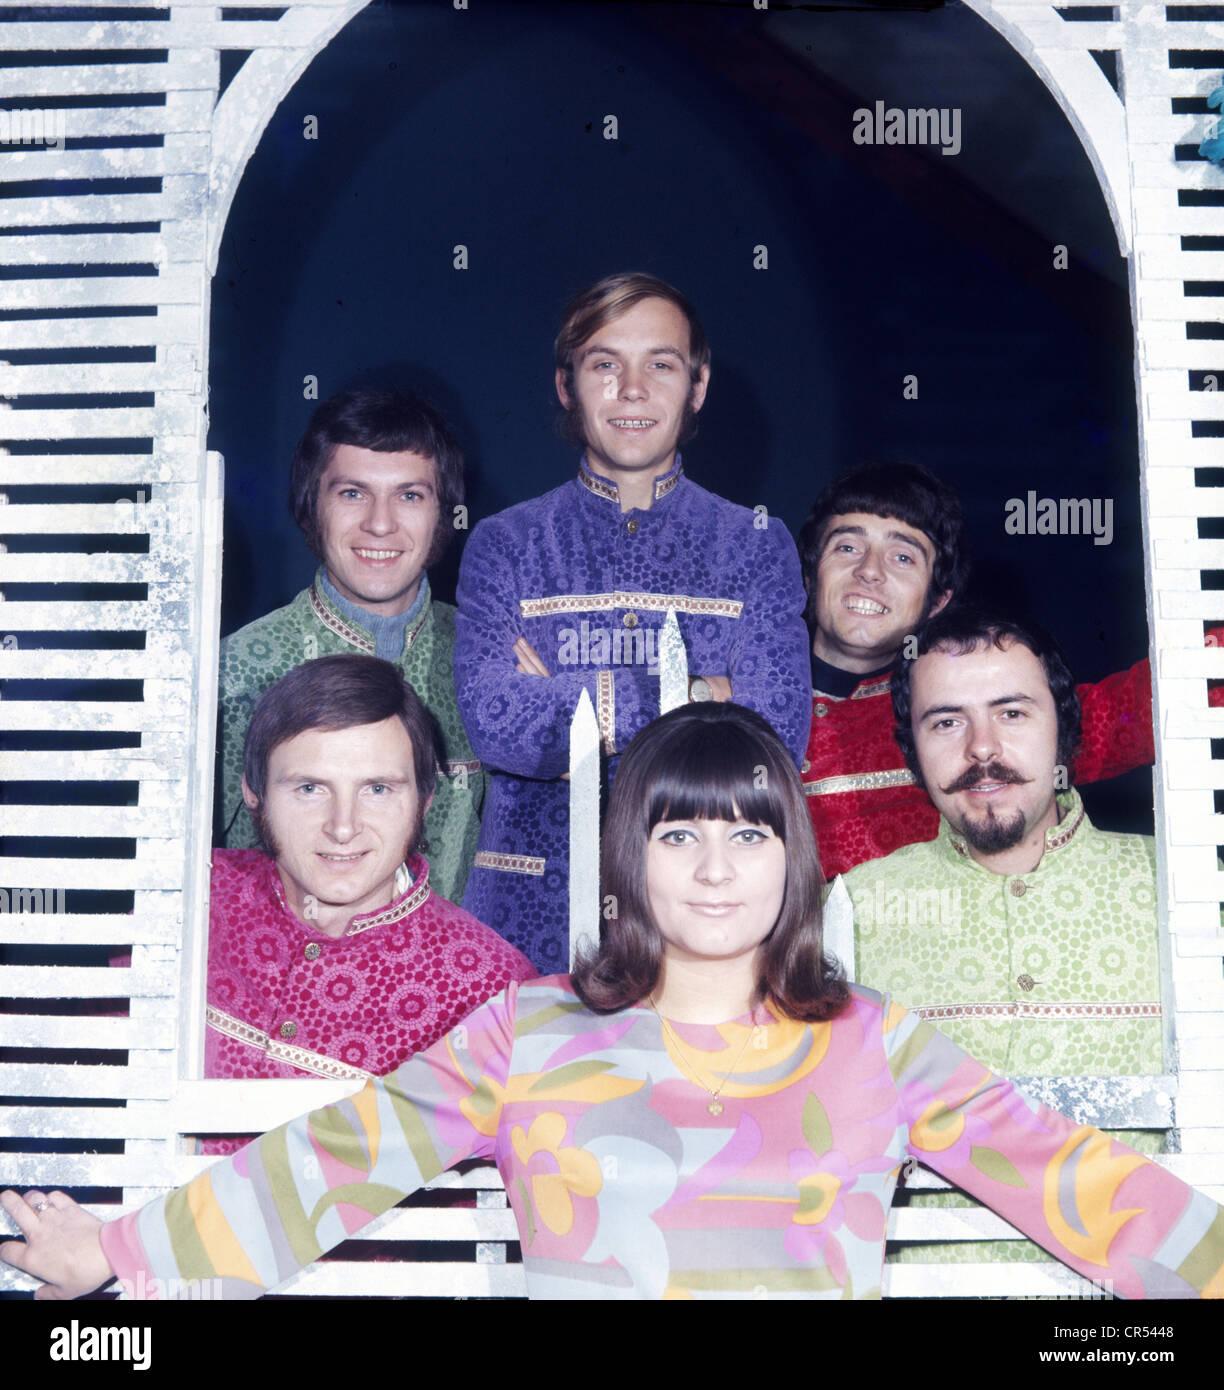 Fleming, Joy, * 15.11.1944, German singer, group Joy and The Hit Kids, with Dieter Kindl, Gerd Koethe, Hans Herkenne, - Stock Image